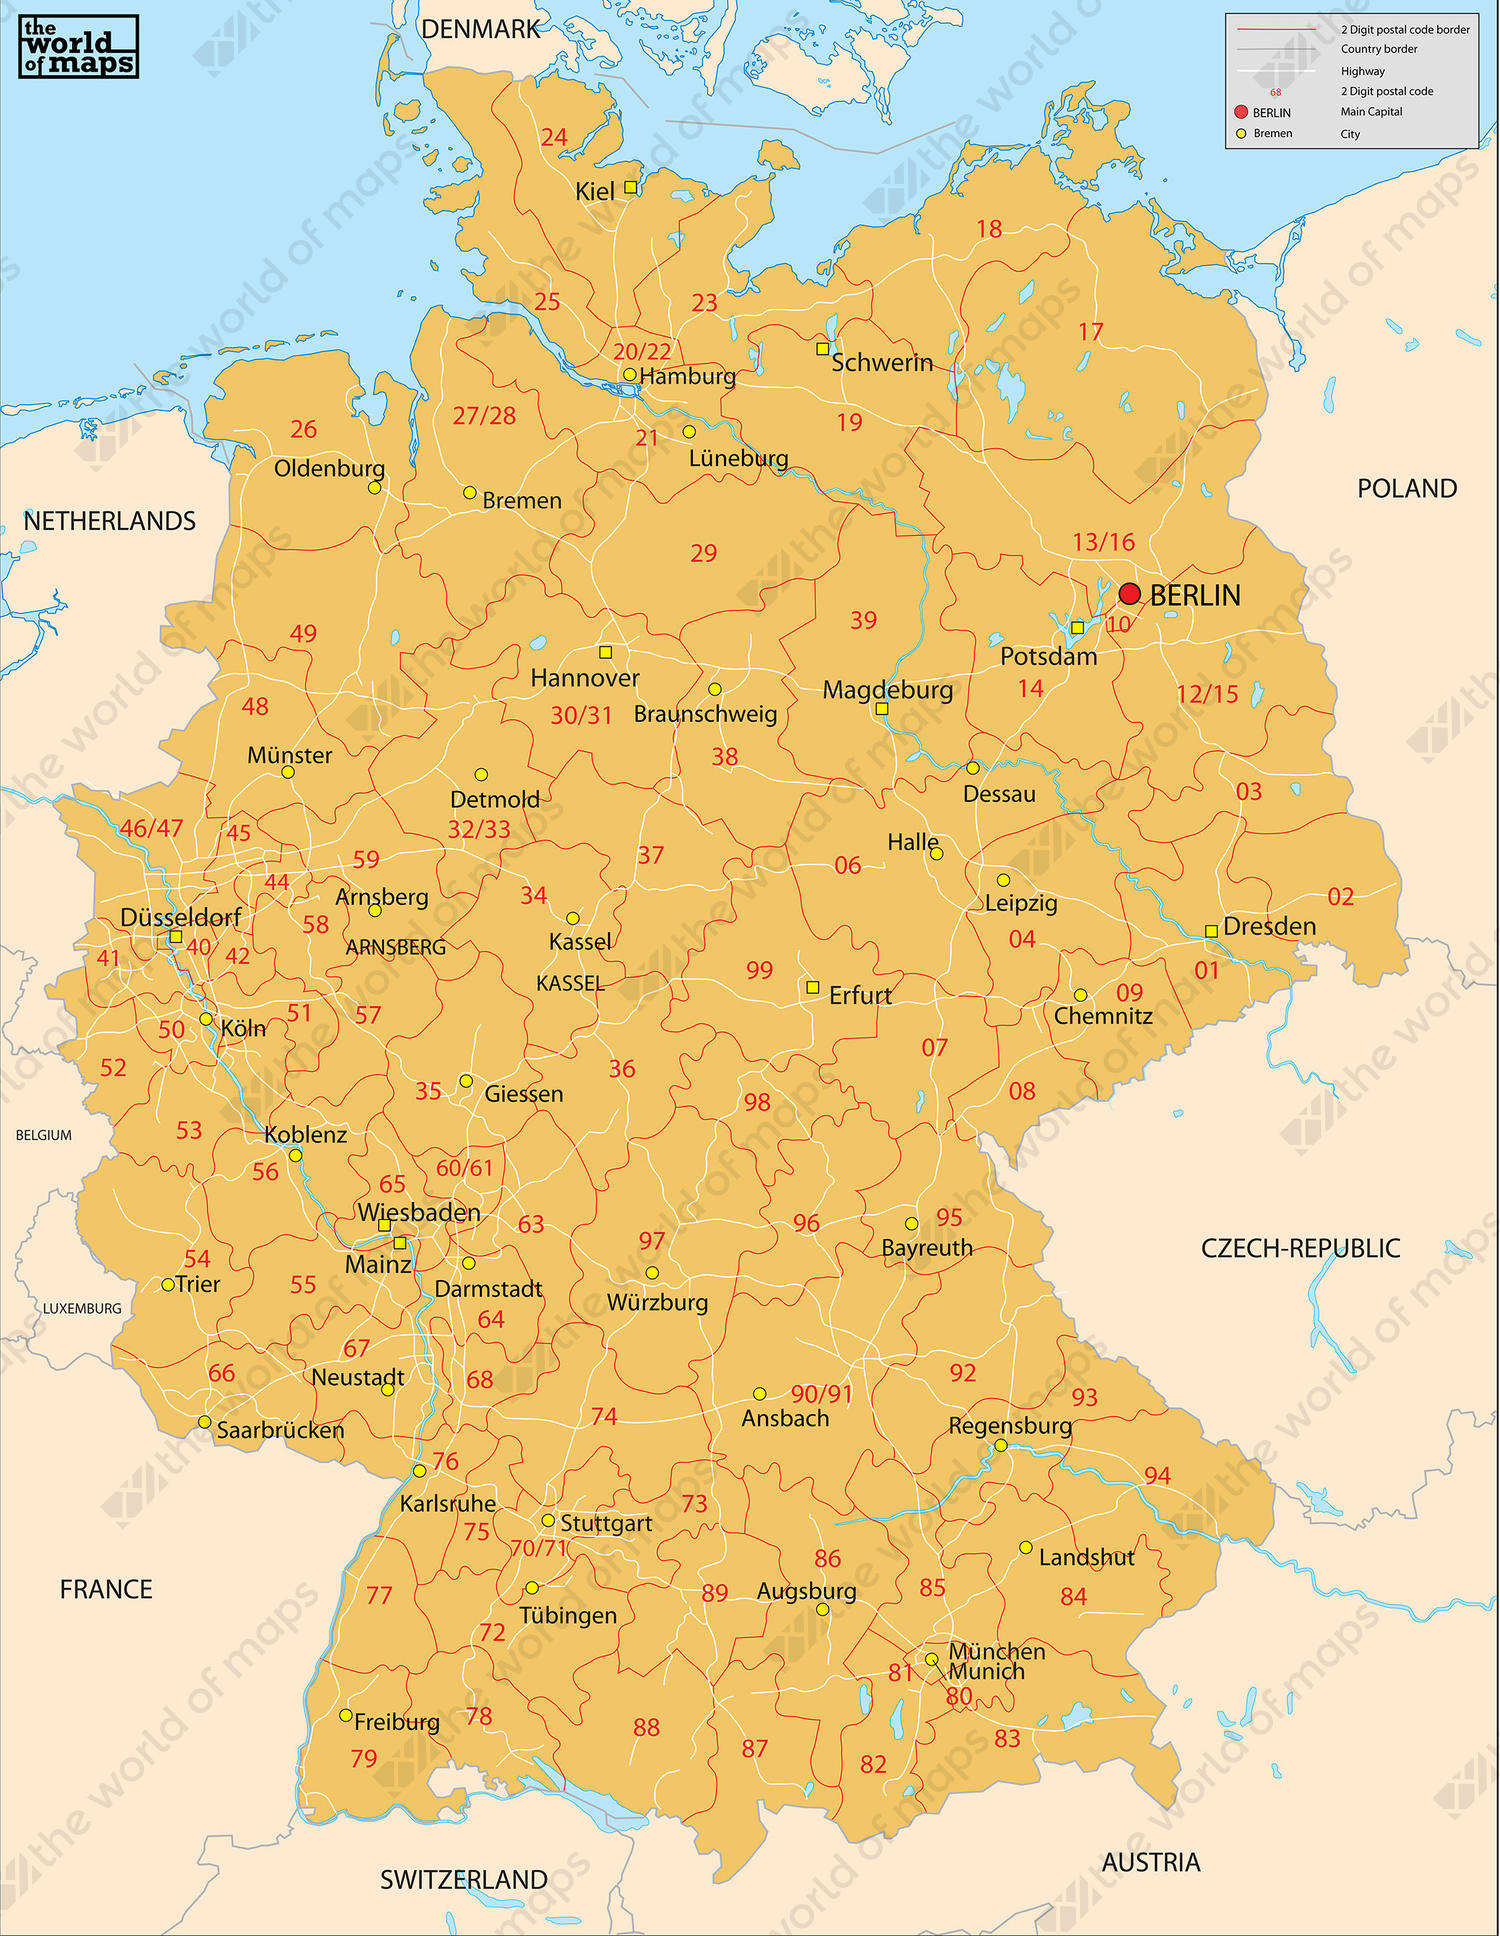 Digital postcode map Germany 2digit 81 The World of Mapscom